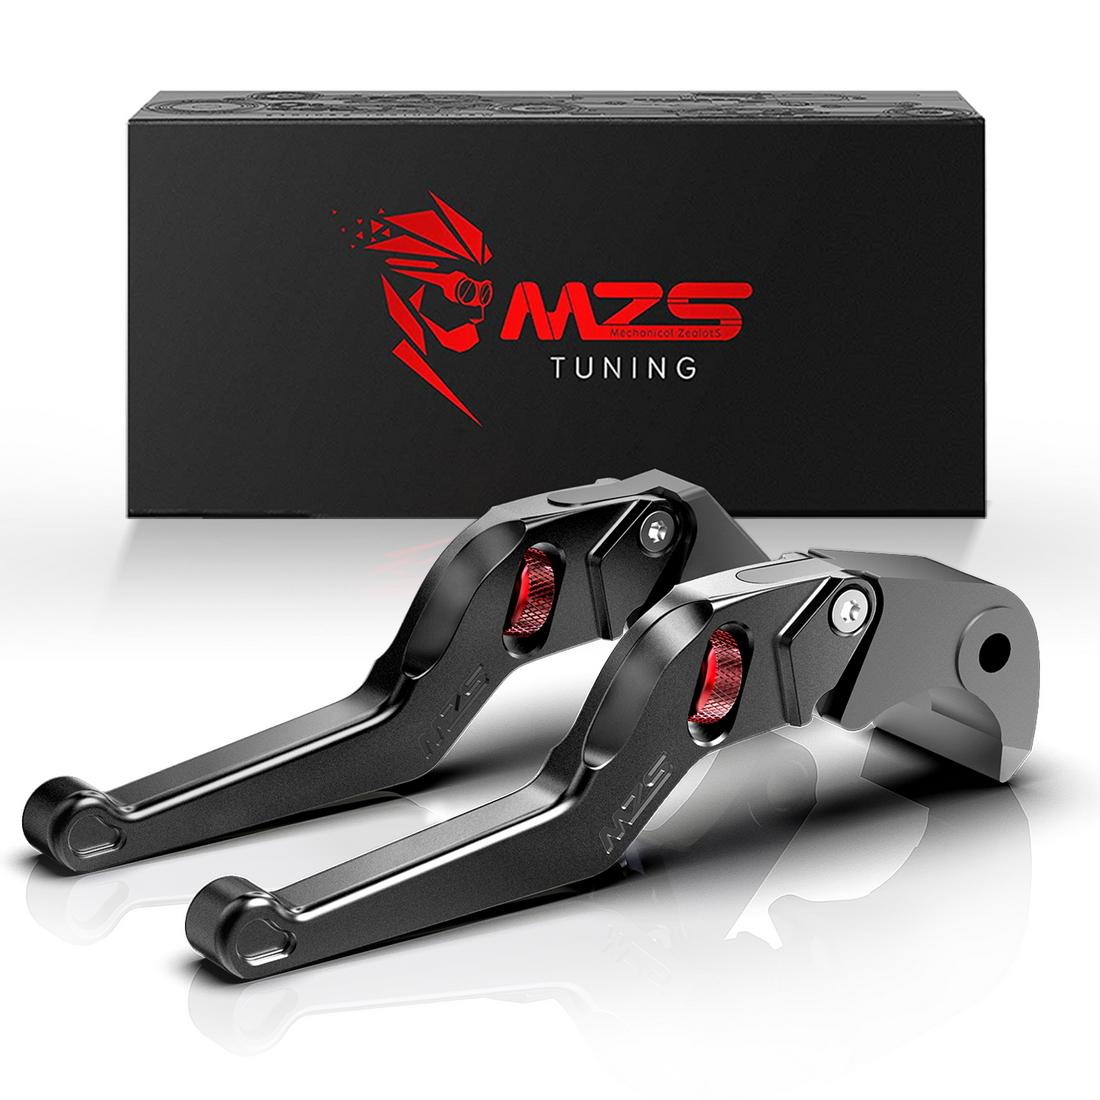 For Kawasaki Z750 2007-2012 Brake/&Clutch Levers Handle Grips Motorcycle Adjust